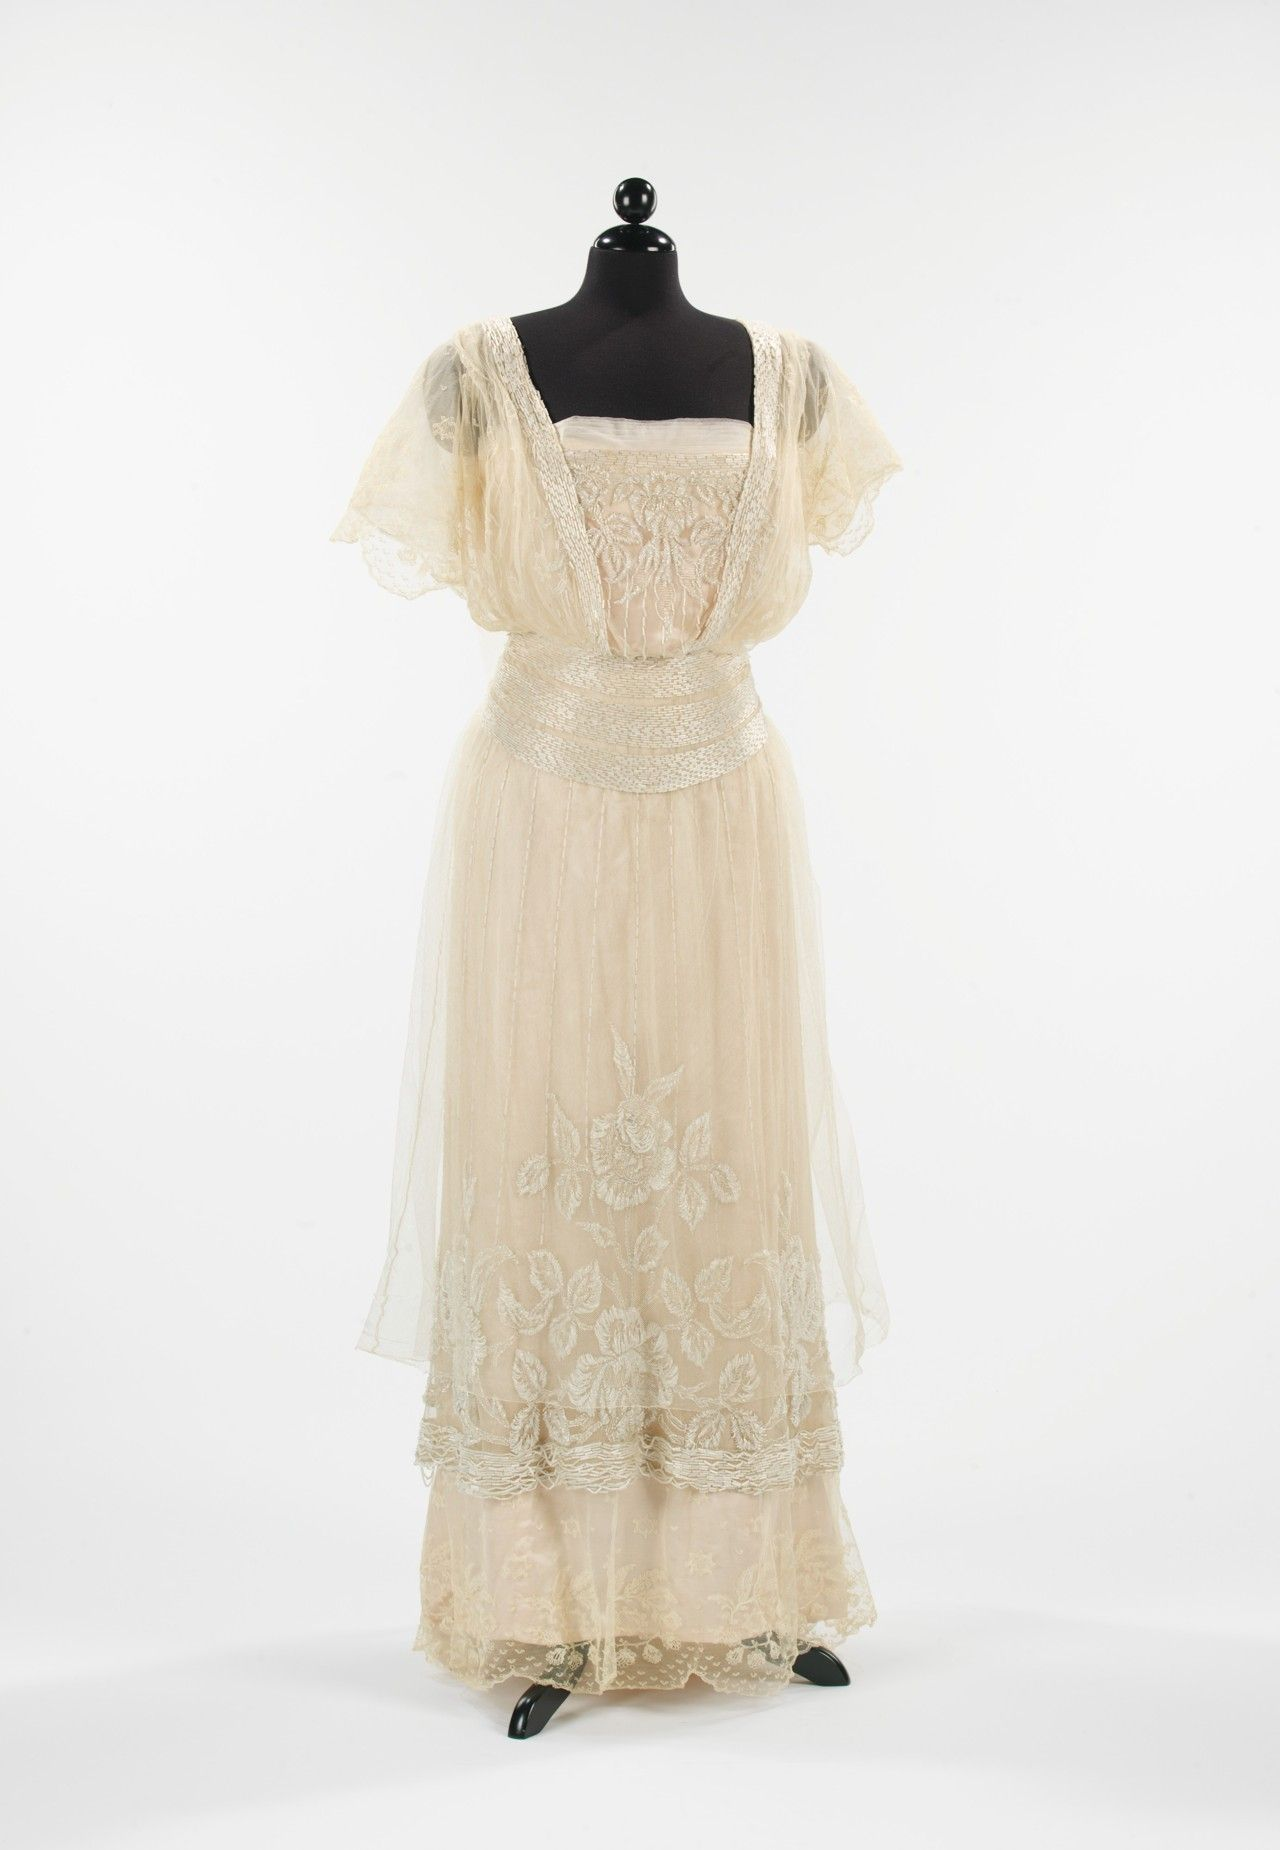 Evening dress, 1911-12 (front)  From the METROPOLITAN MUSEUM OF ART